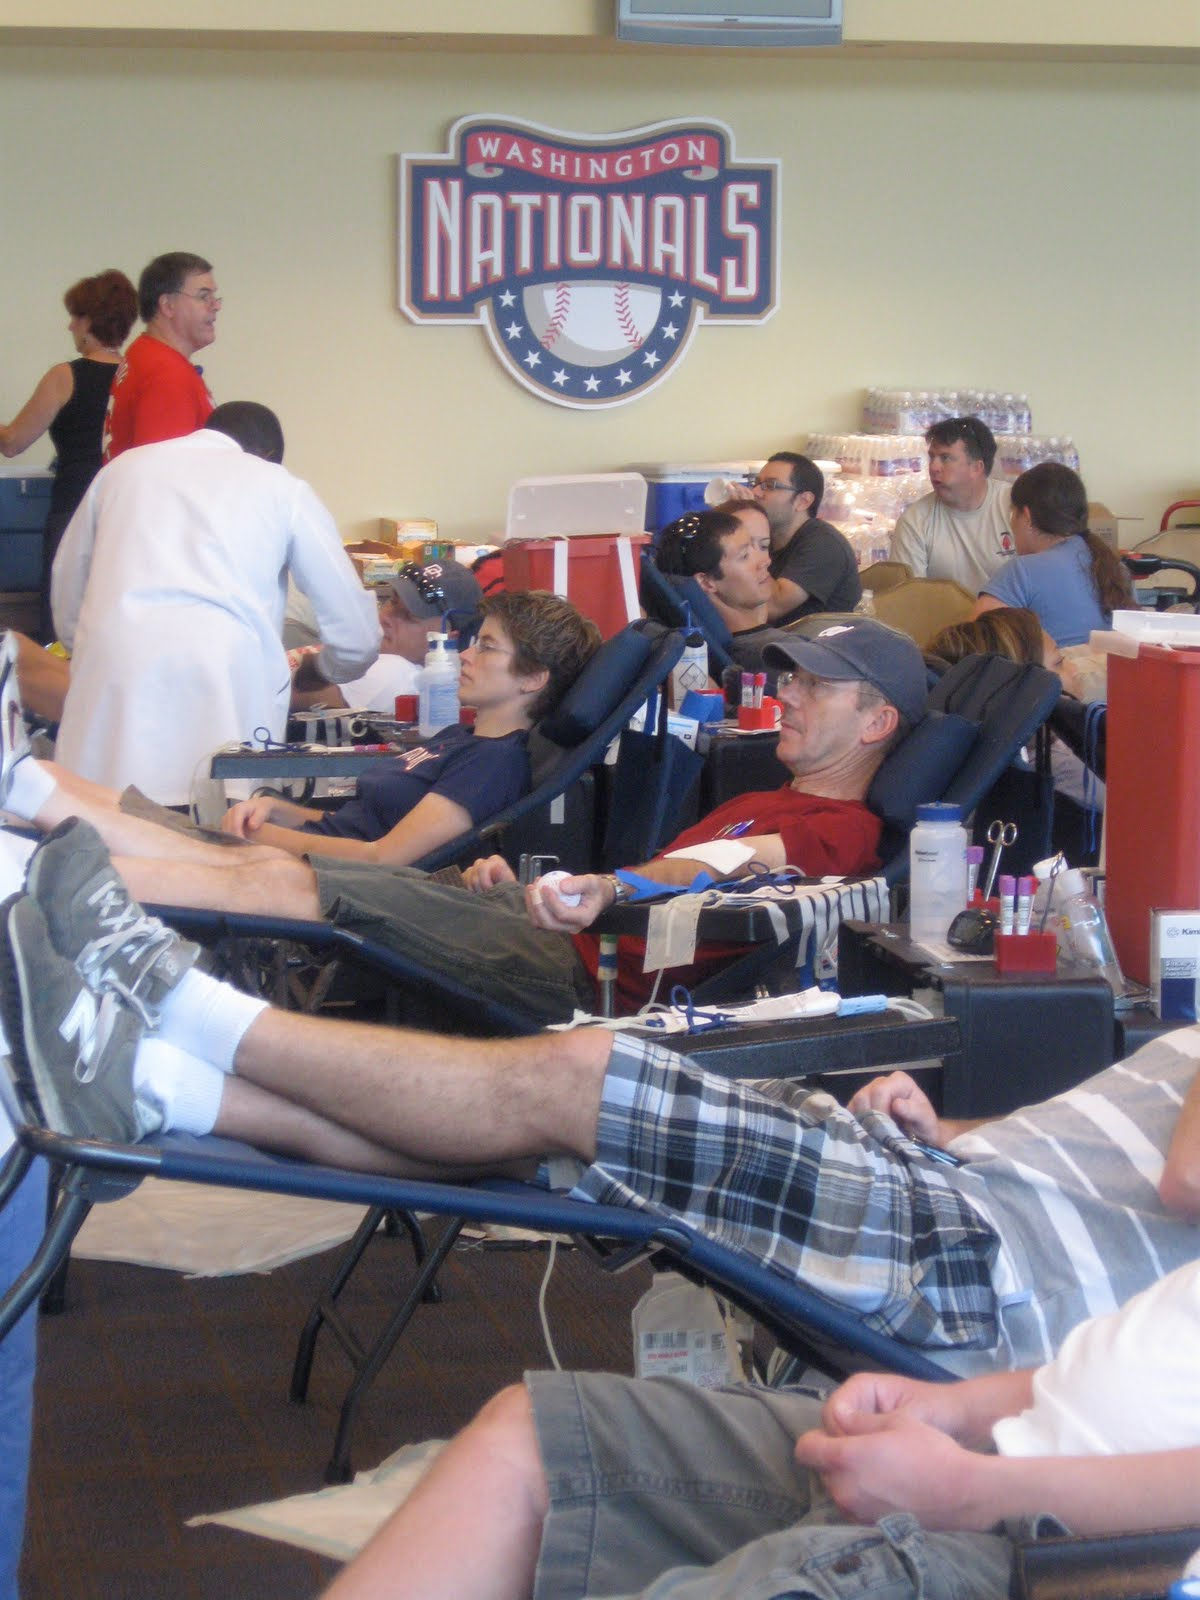 Nats320 -- A Washington Nationals Blog: 2010 INOVA Blood ...